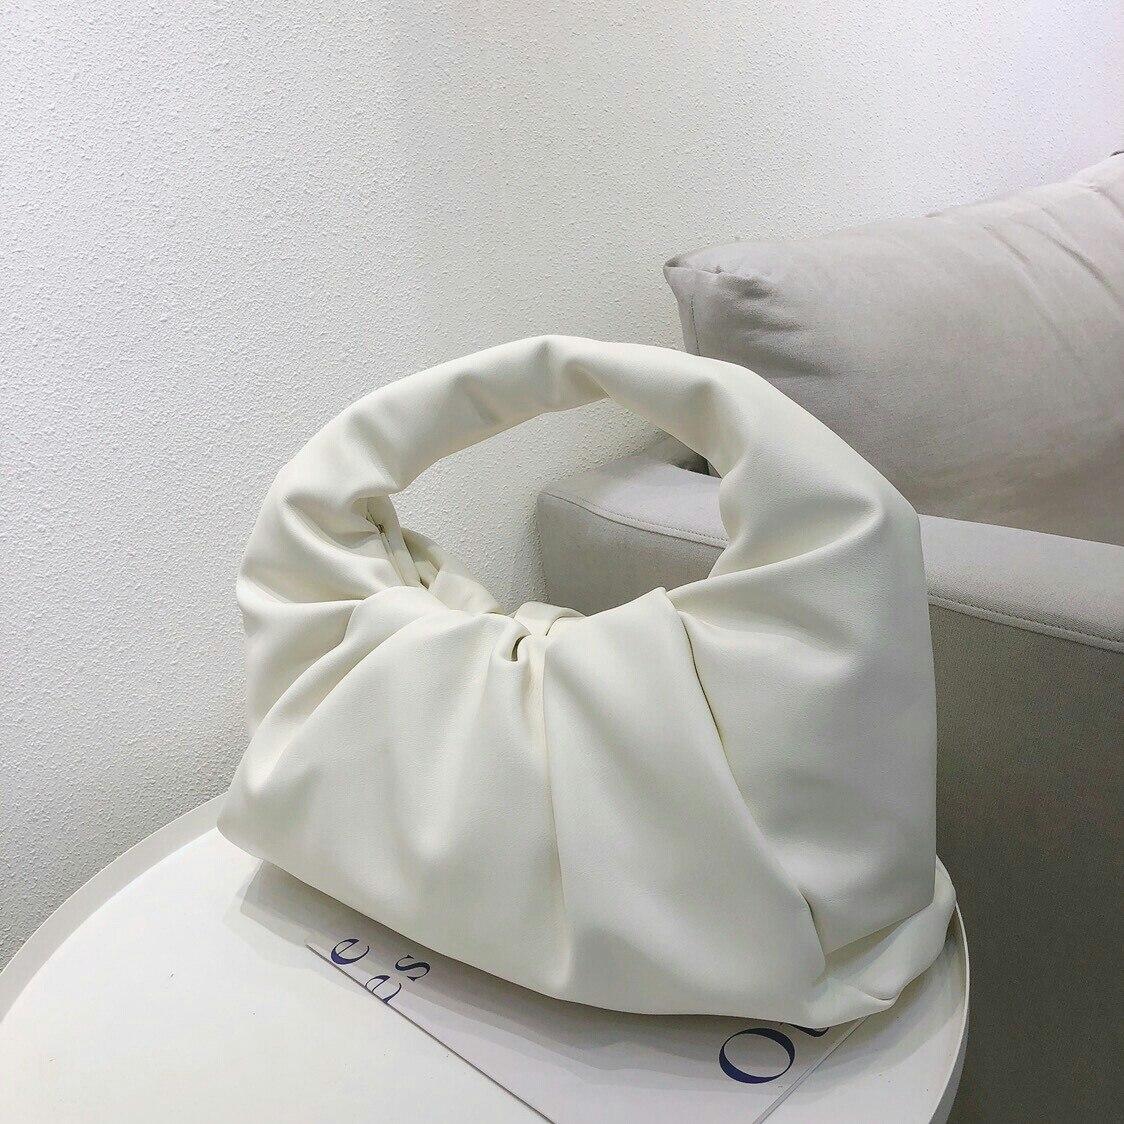 Fashion Pu Shoulder Bags For Women Soft Leather Handbags Retro Solid Color Underarm Bags Elegant Ladies Handbag Shoulder Bag